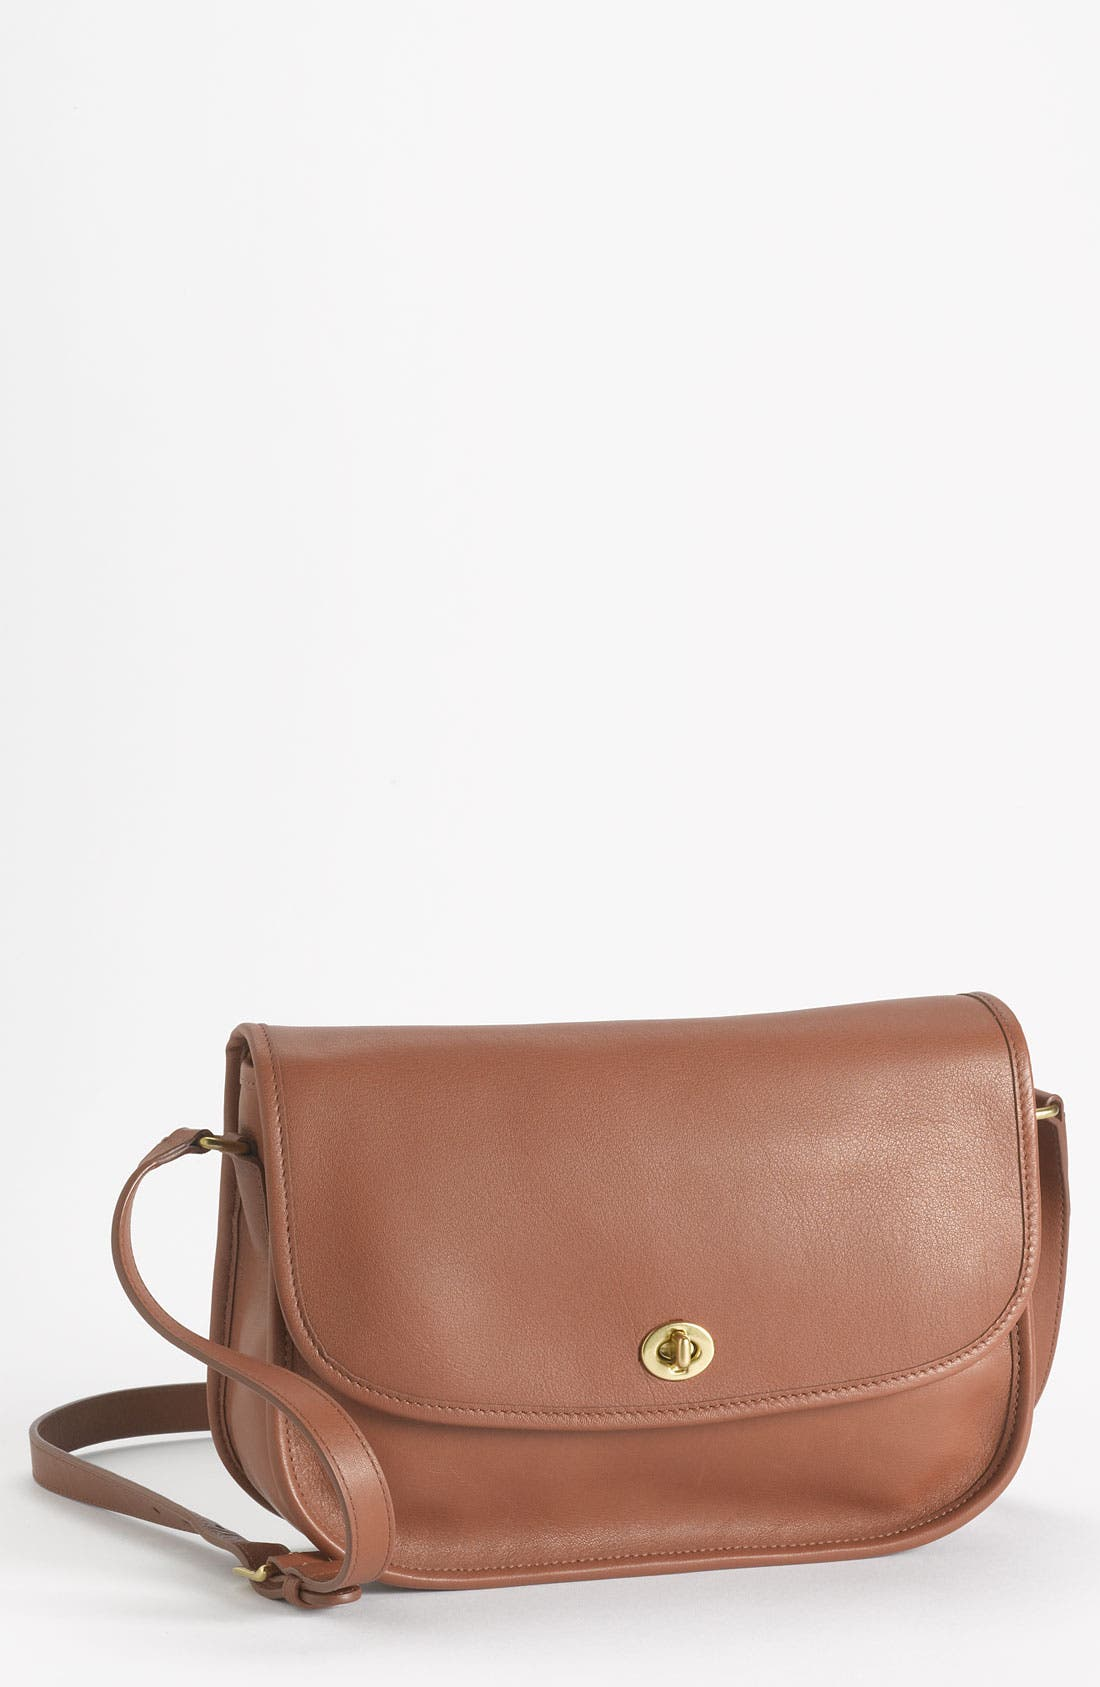 Main Image - COACH 'City' Leather Crossbody Bag